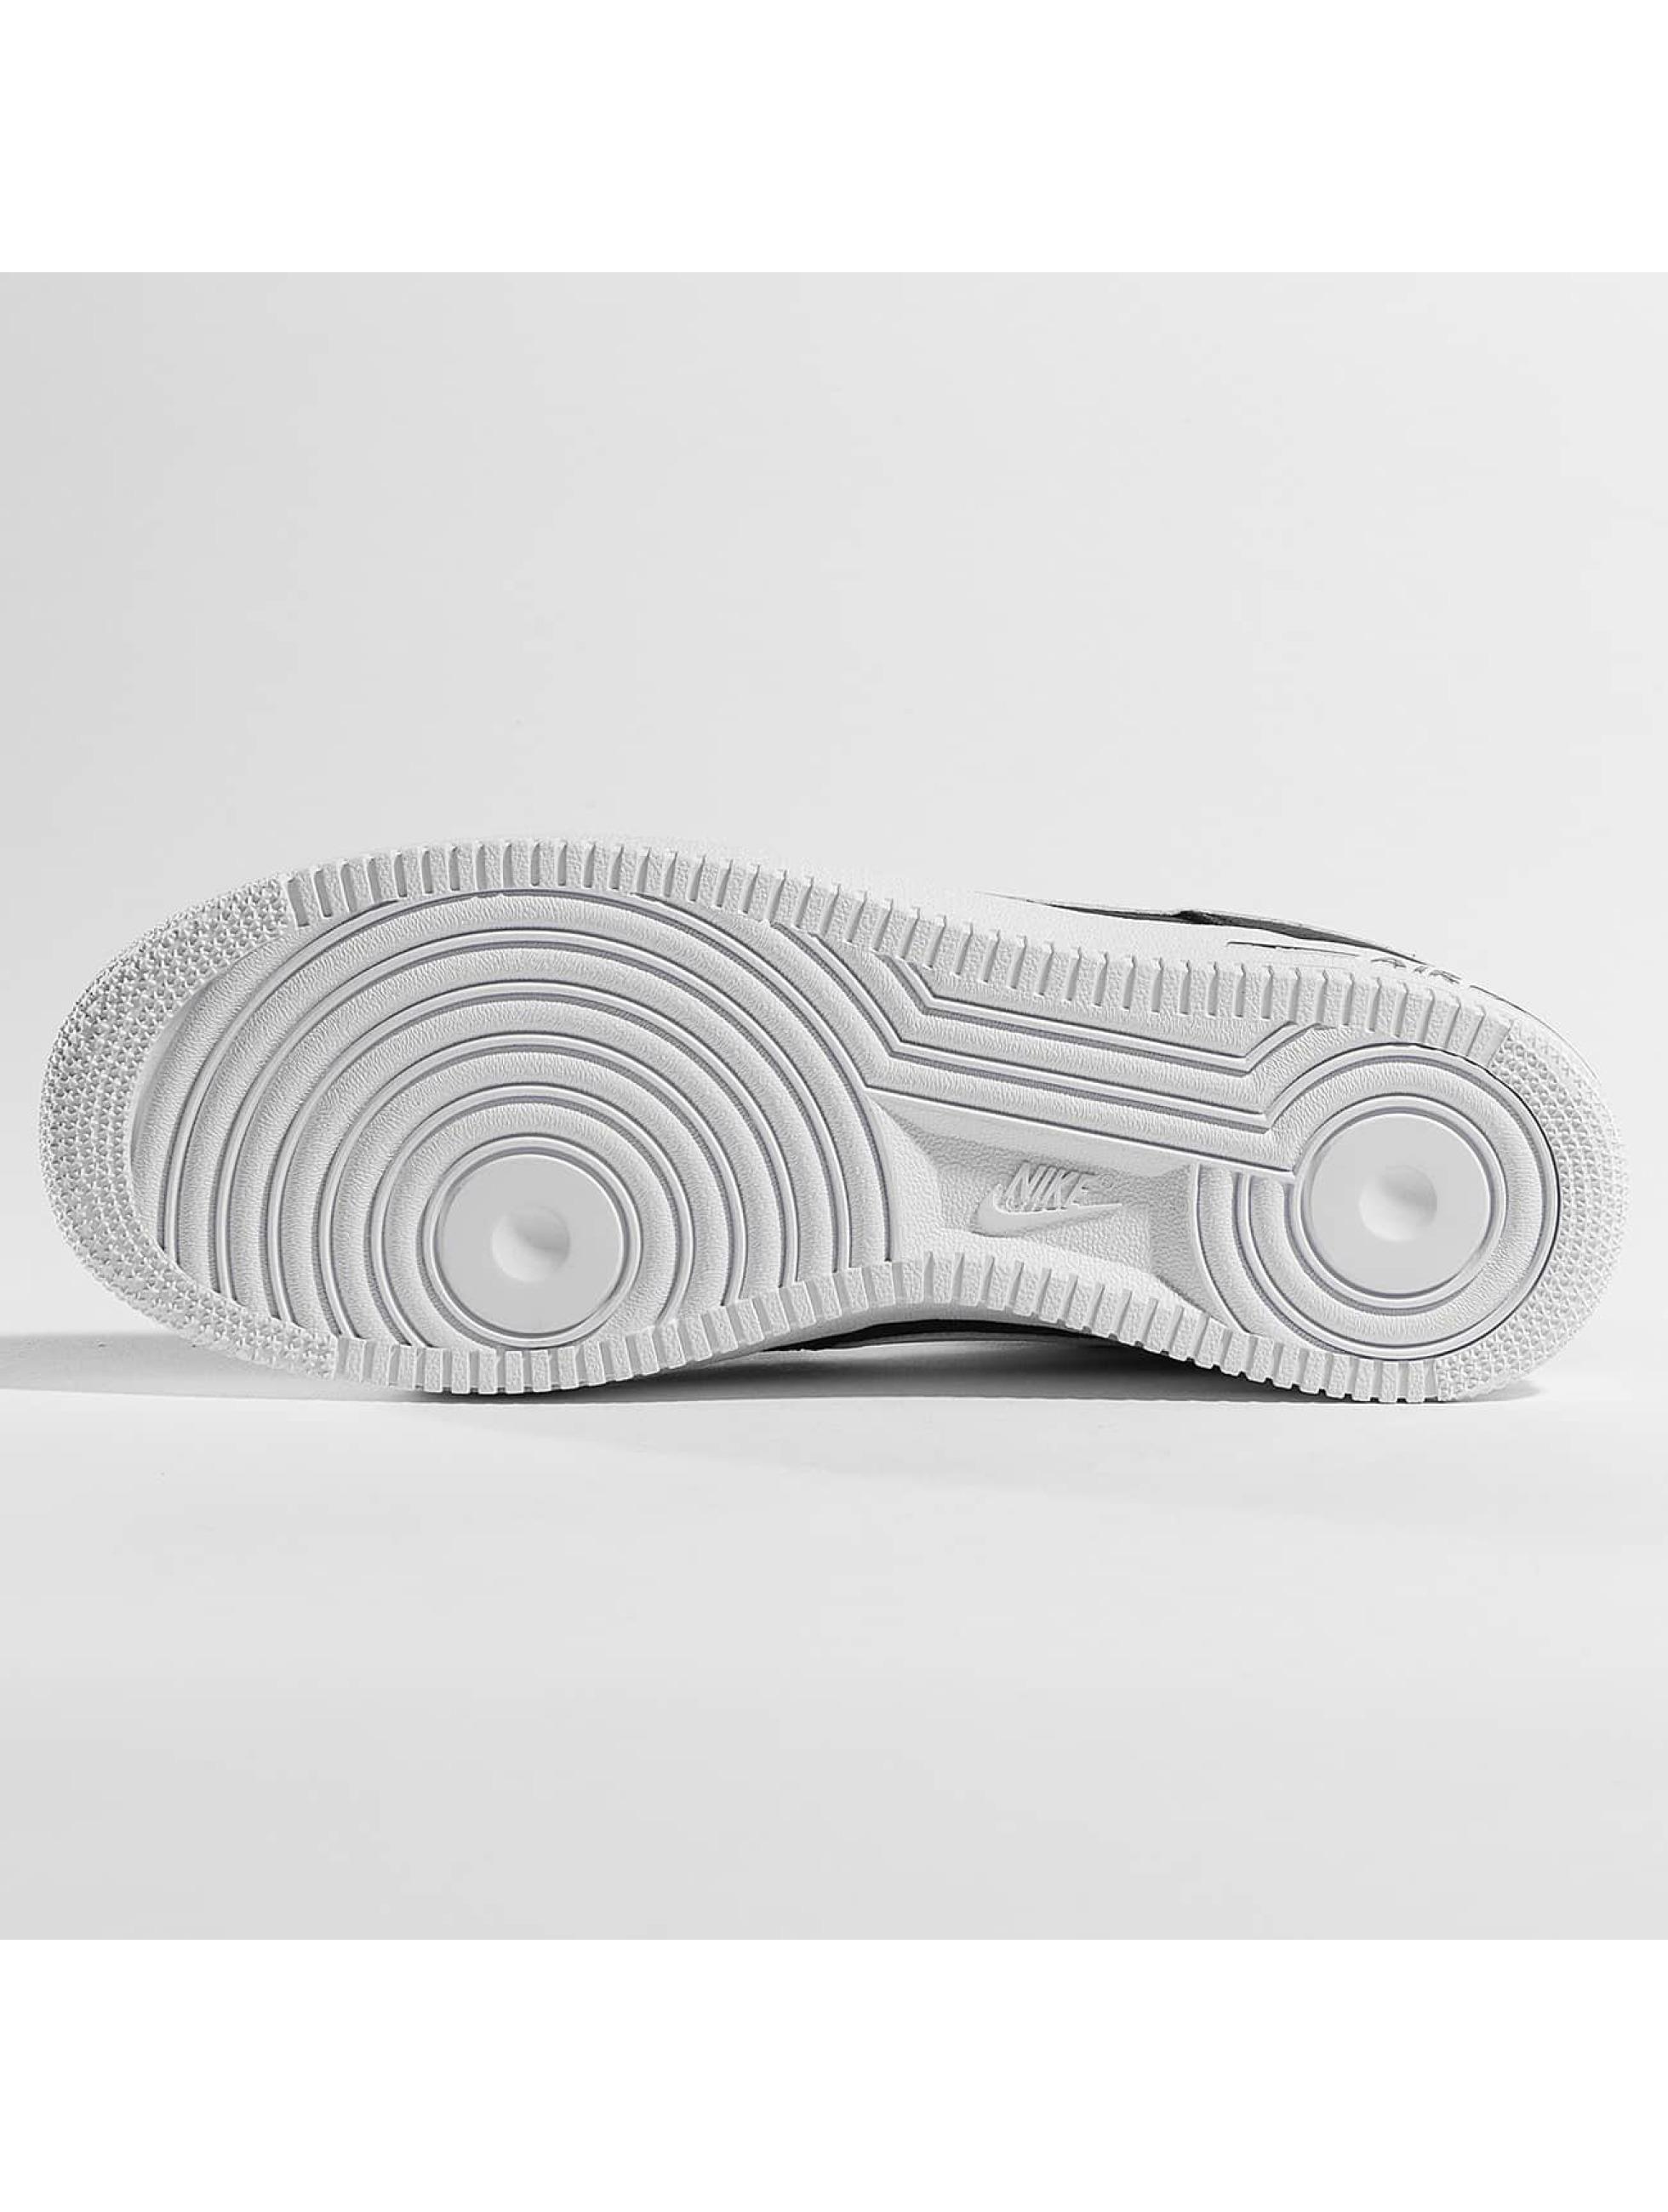 Nike Sneakers Nike Air Force 1 07' LV8 black